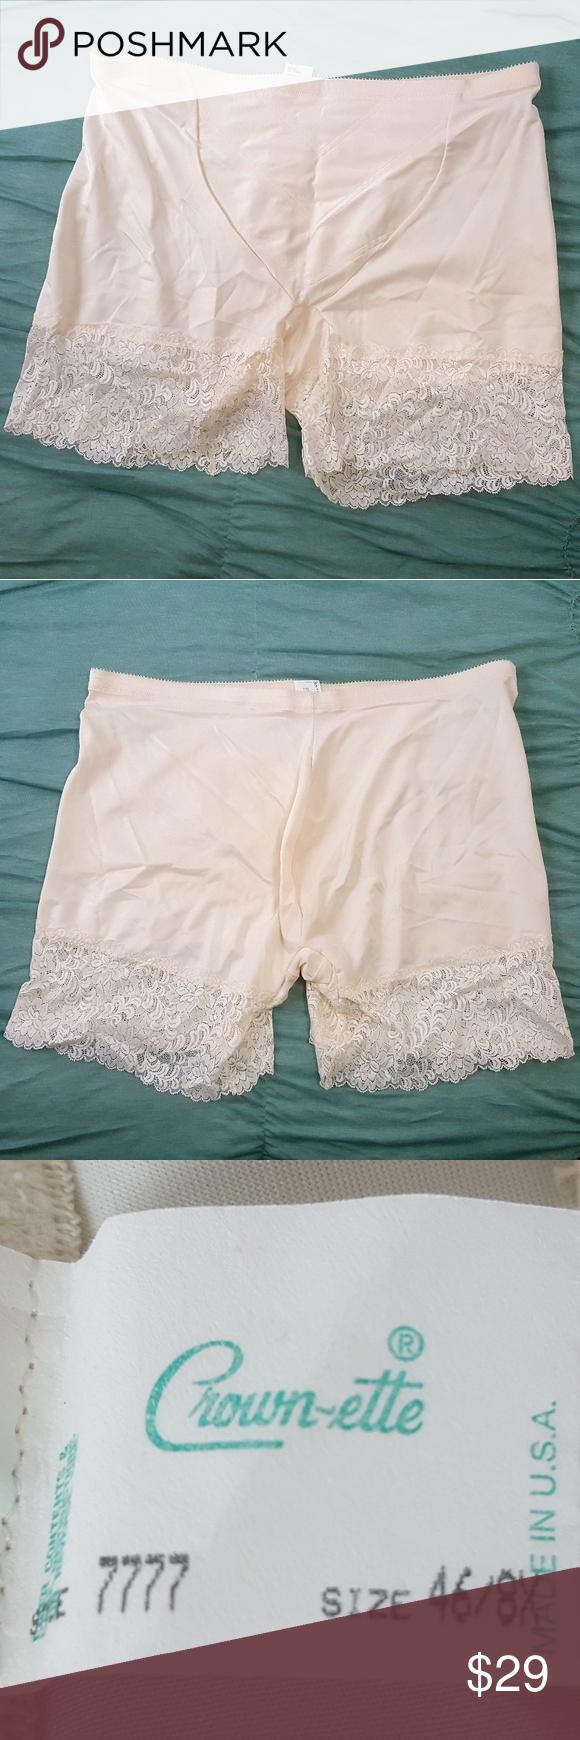 0f7ae6c7eb5b6 Crown-ette Vintage Beige Shaper Panty 46 Crown-ette Vintage Cream ...